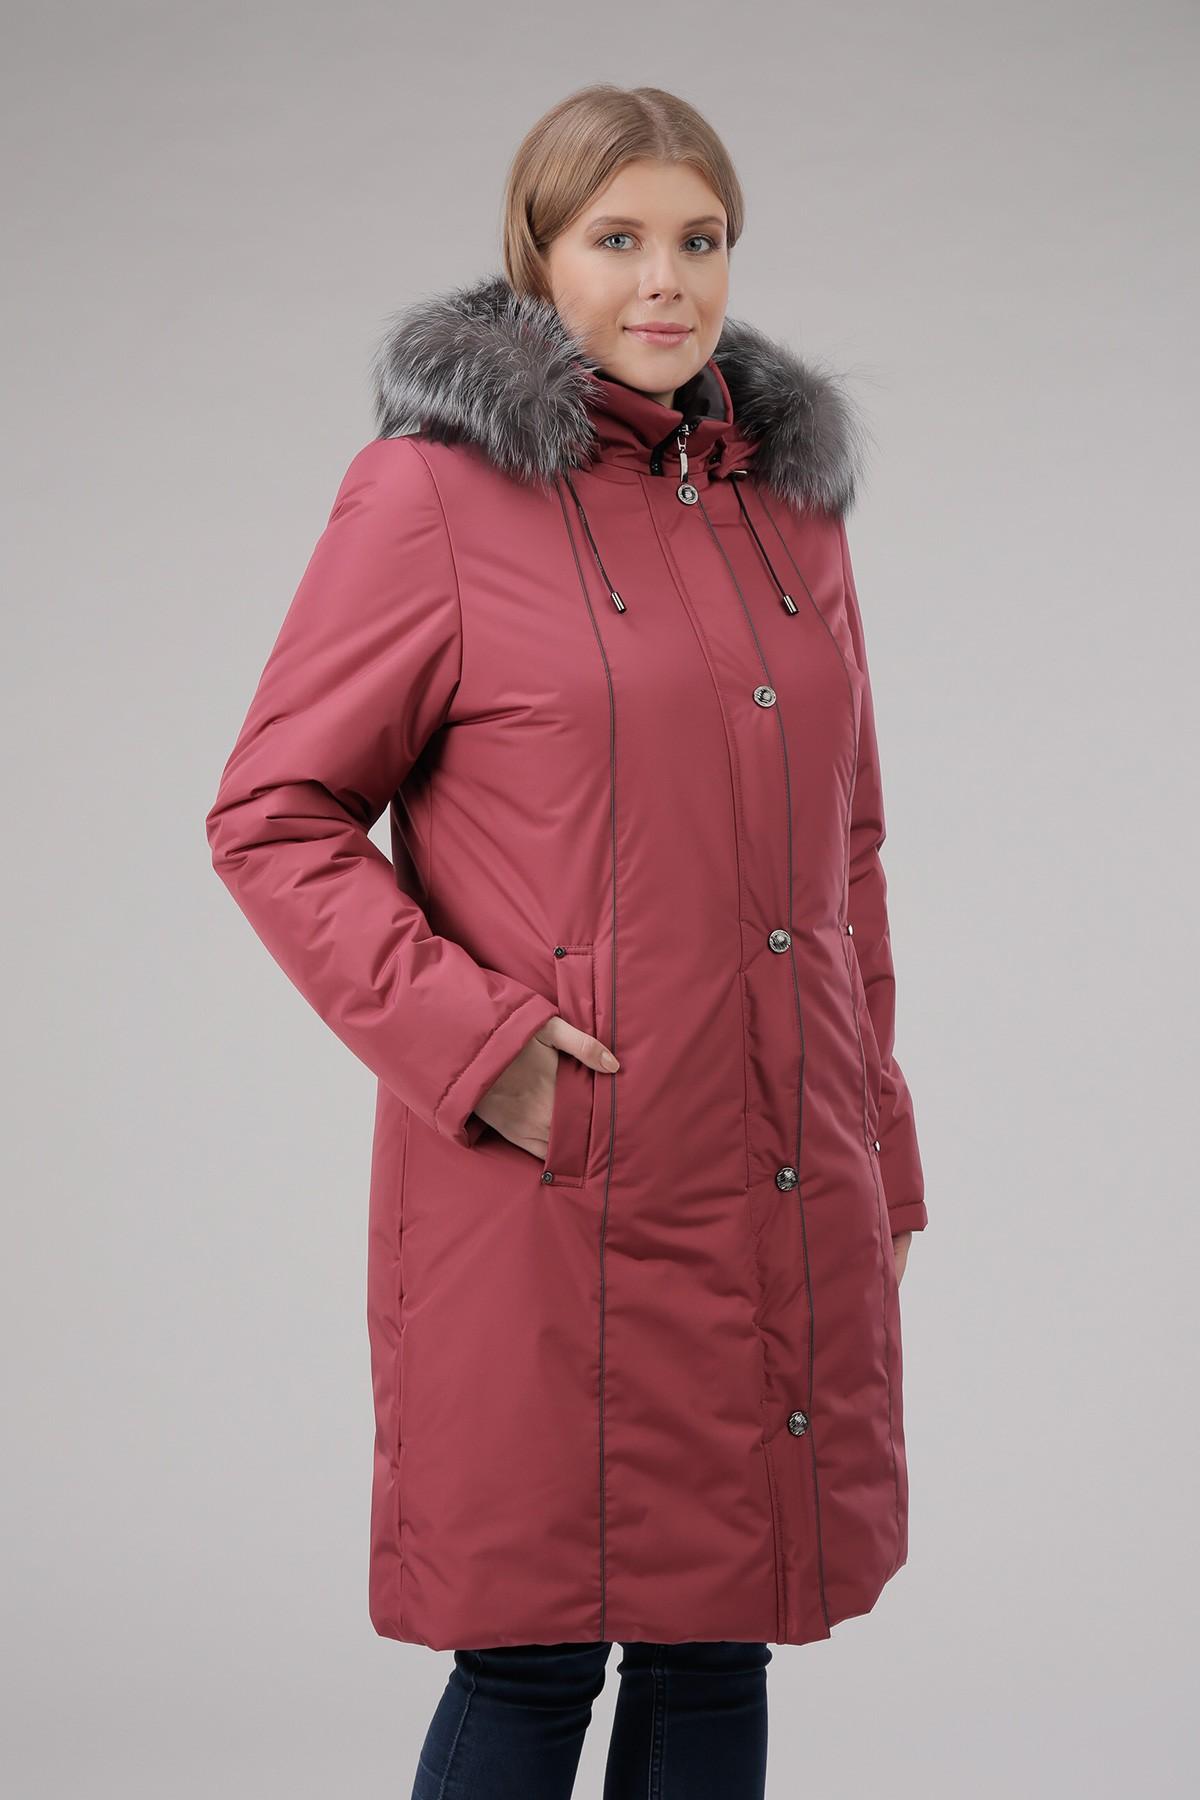 Женская куртка на теплом пуху